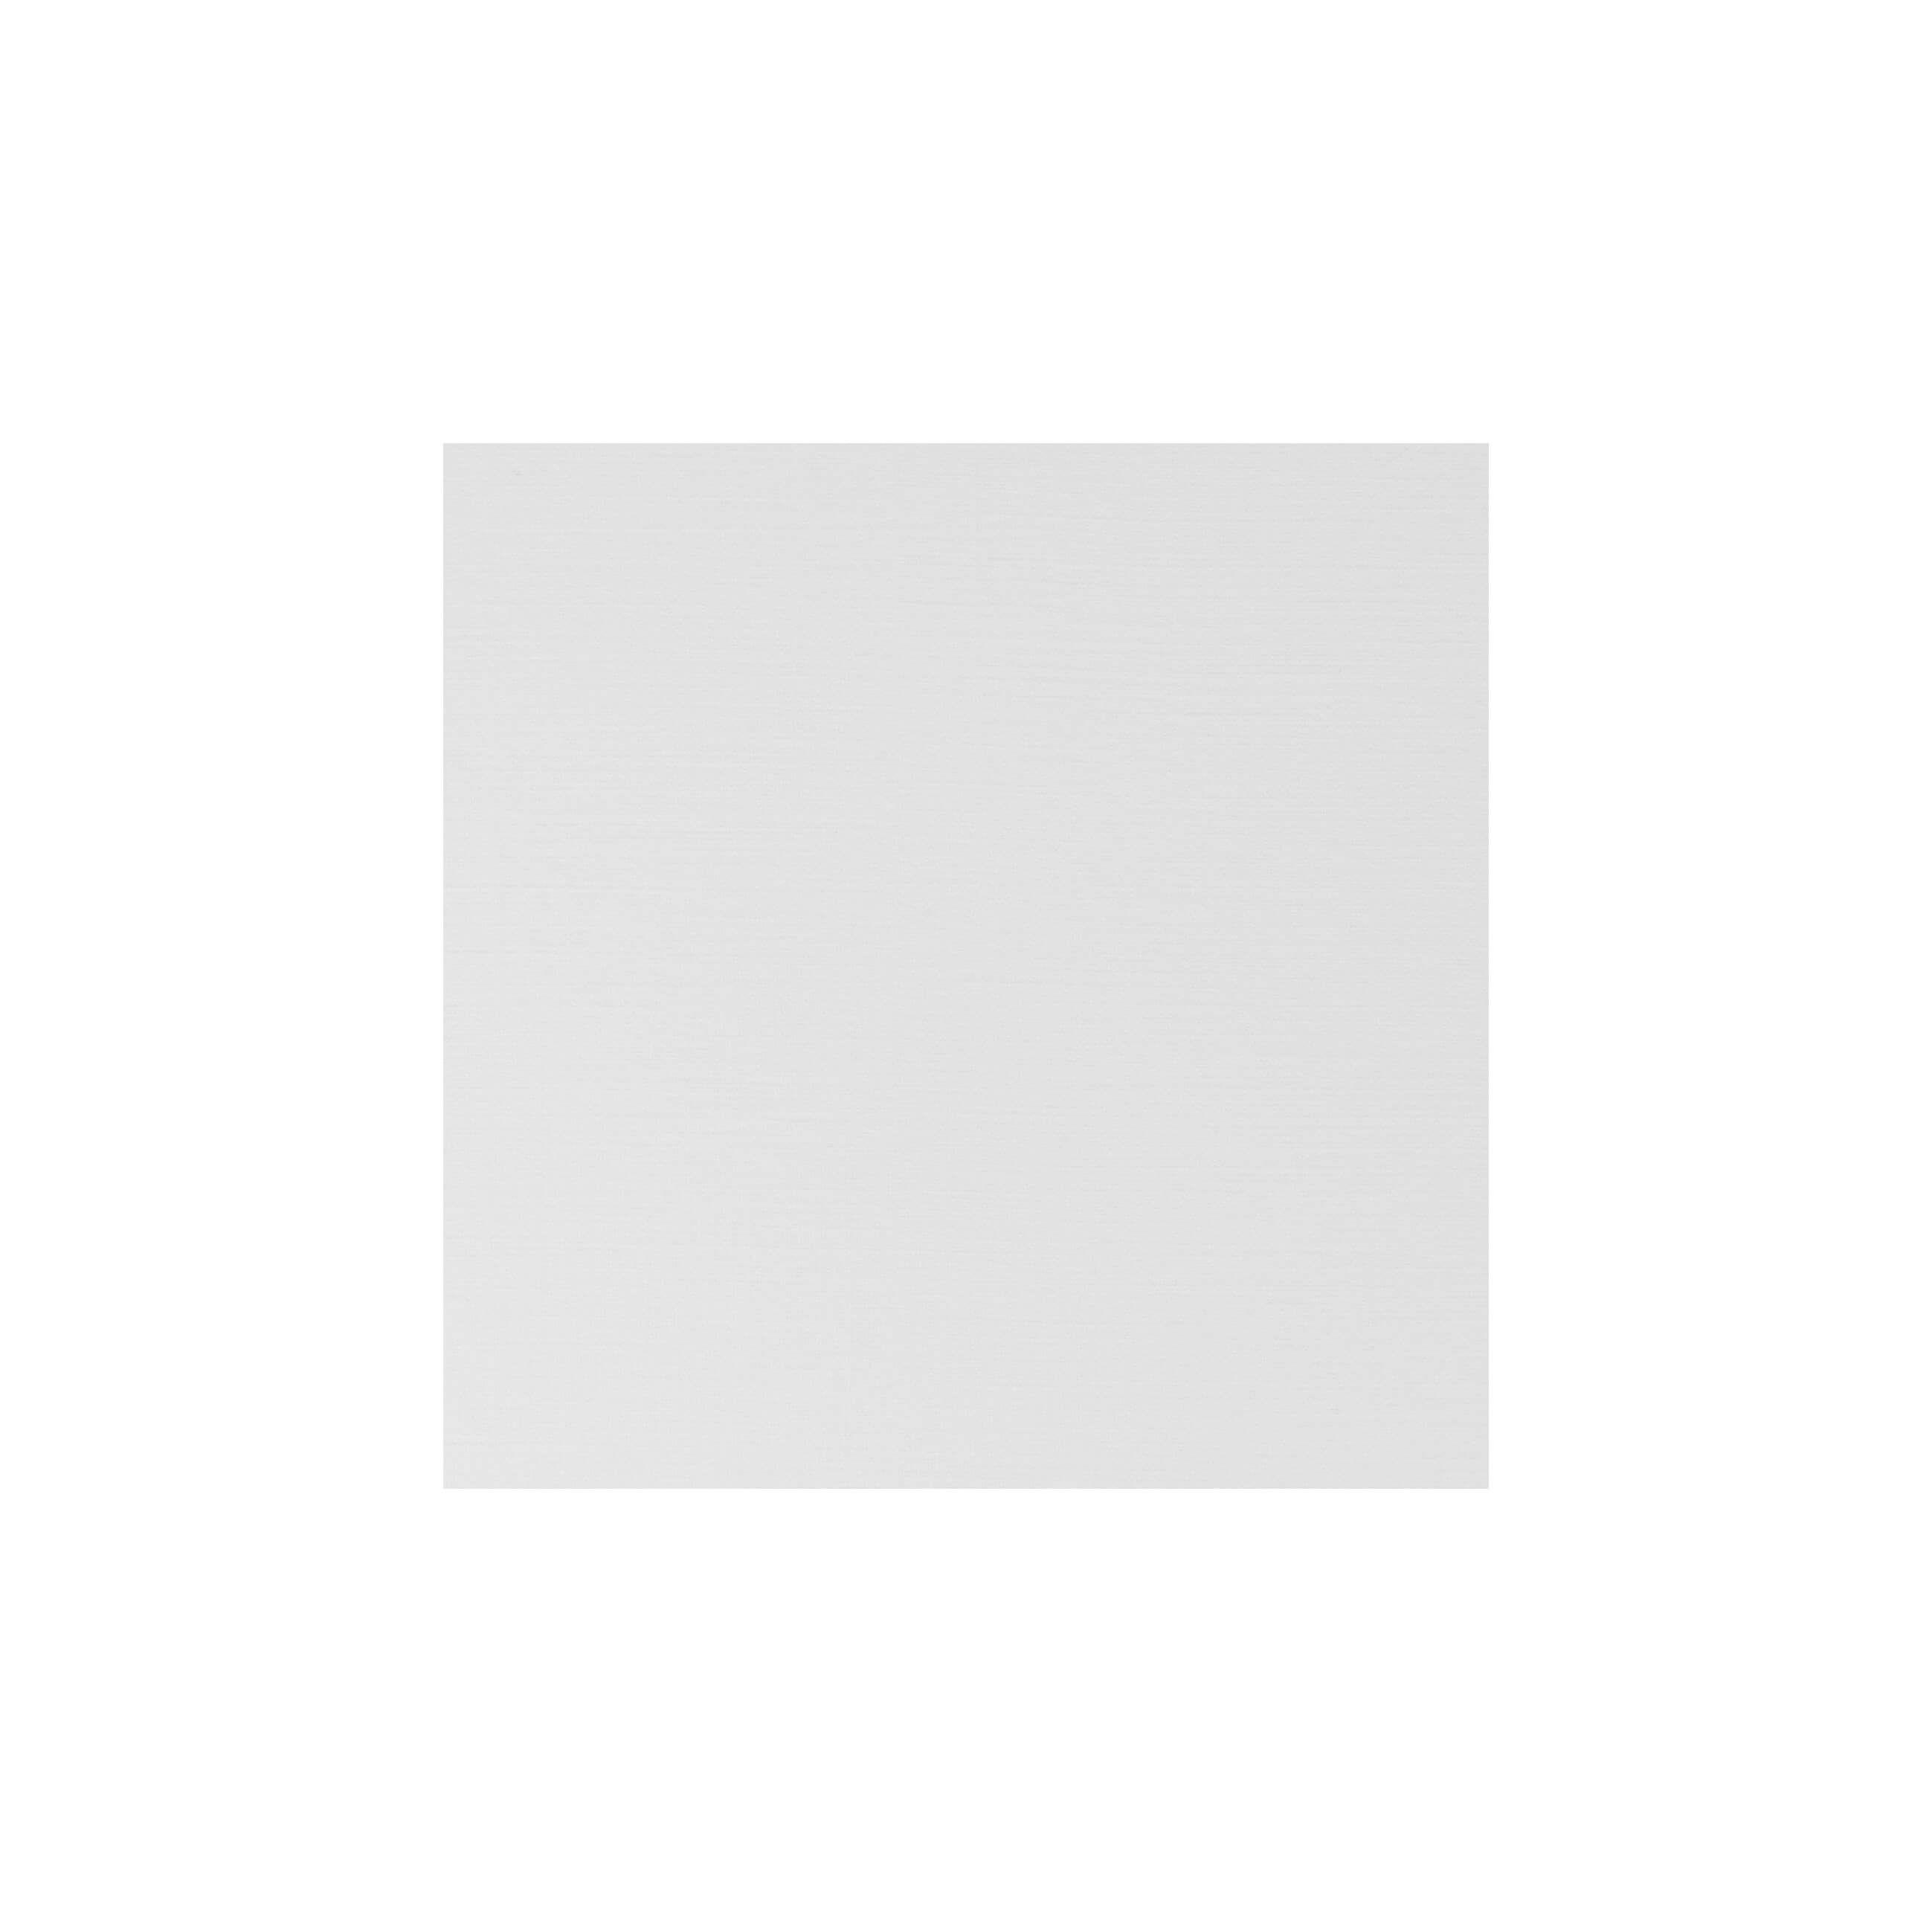 Cardstock 119mm Square - Silkweave White